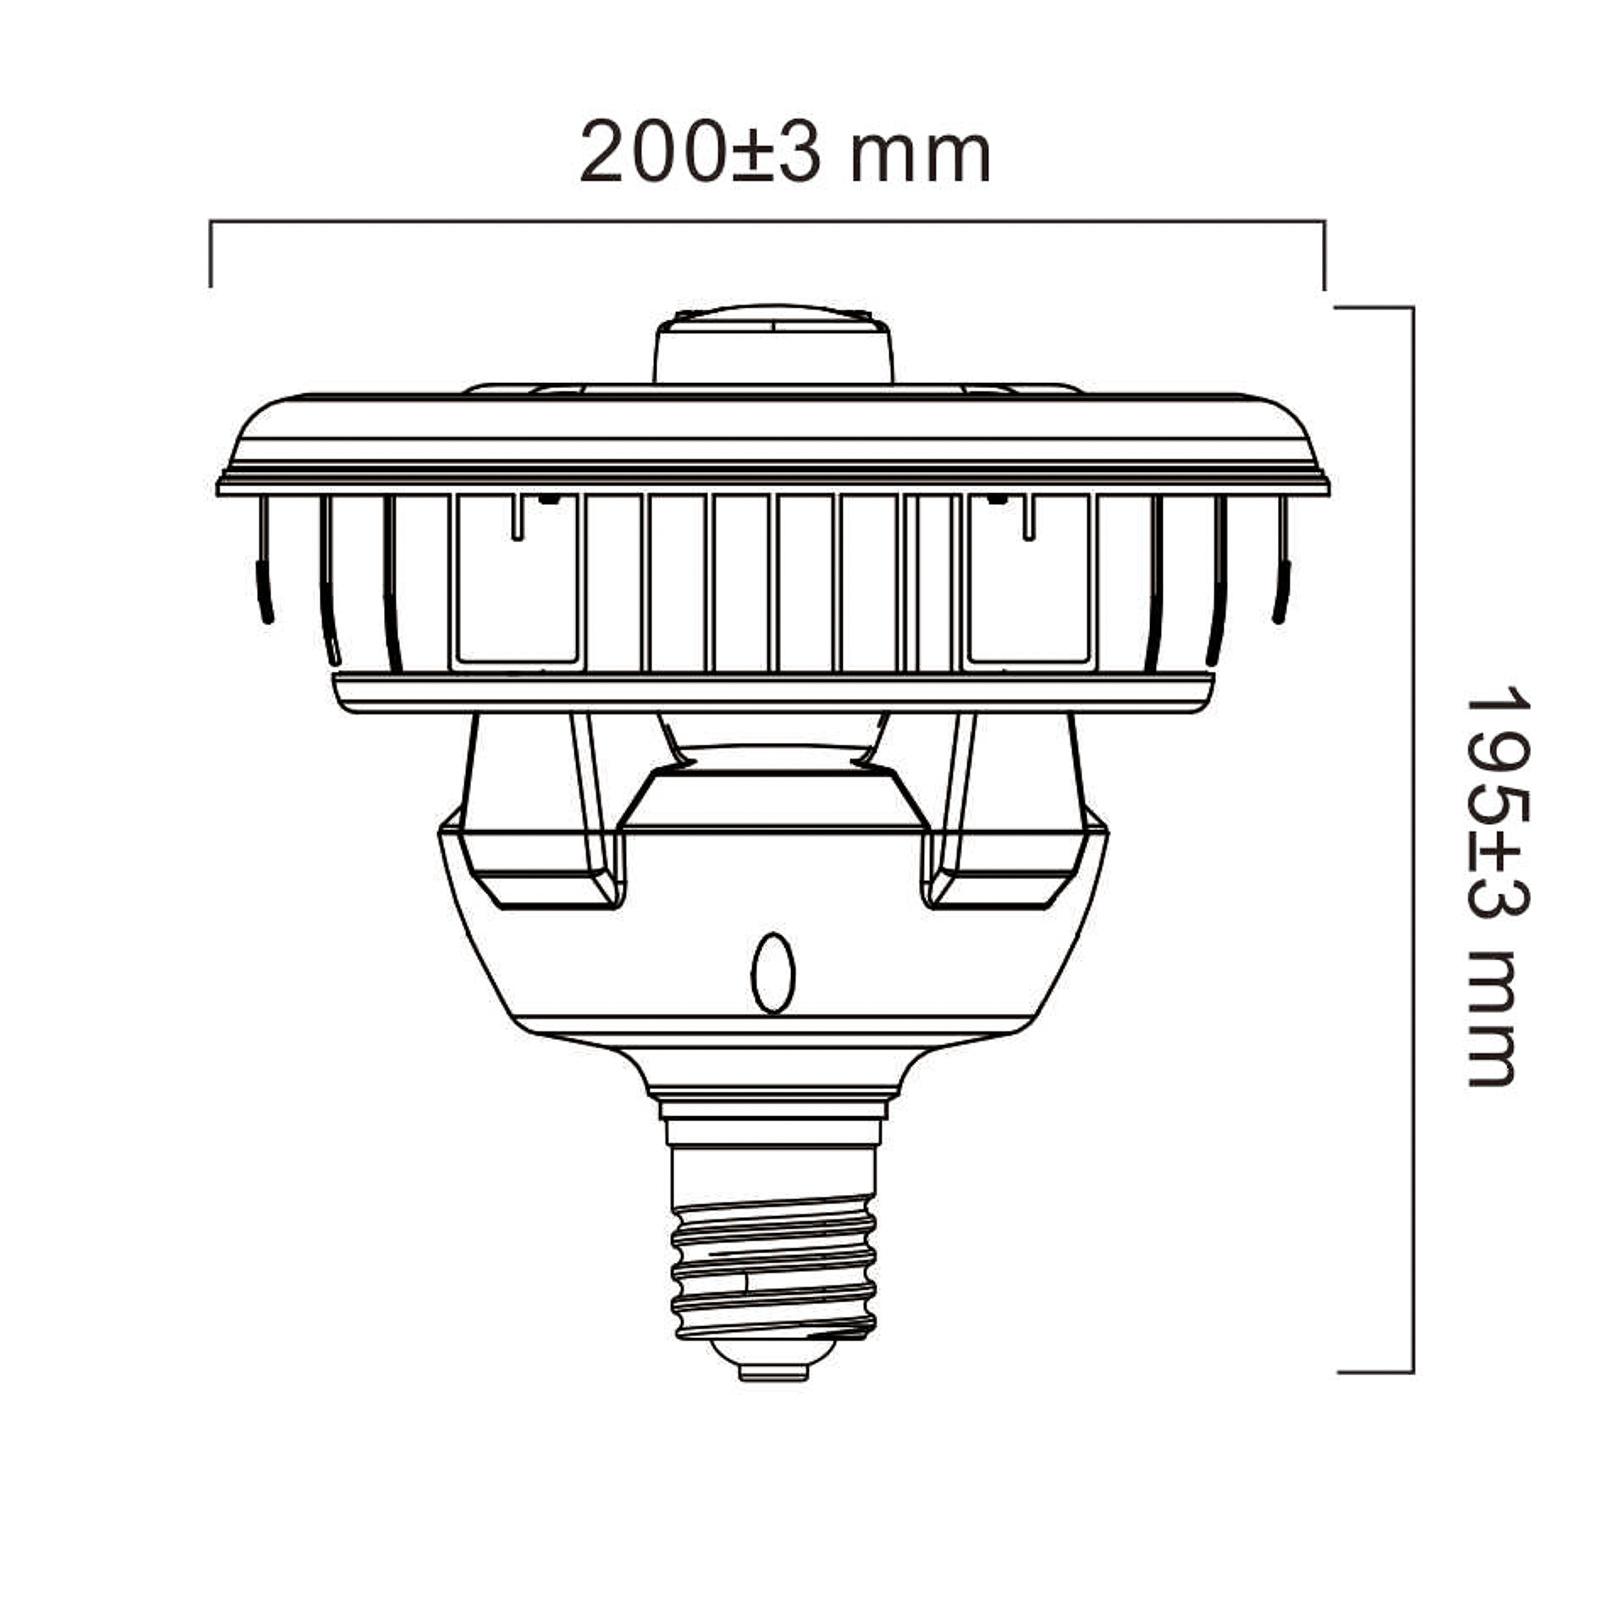 Sylvania-LED-lamppu E40 sis. PIR-anturin 80W 4000K